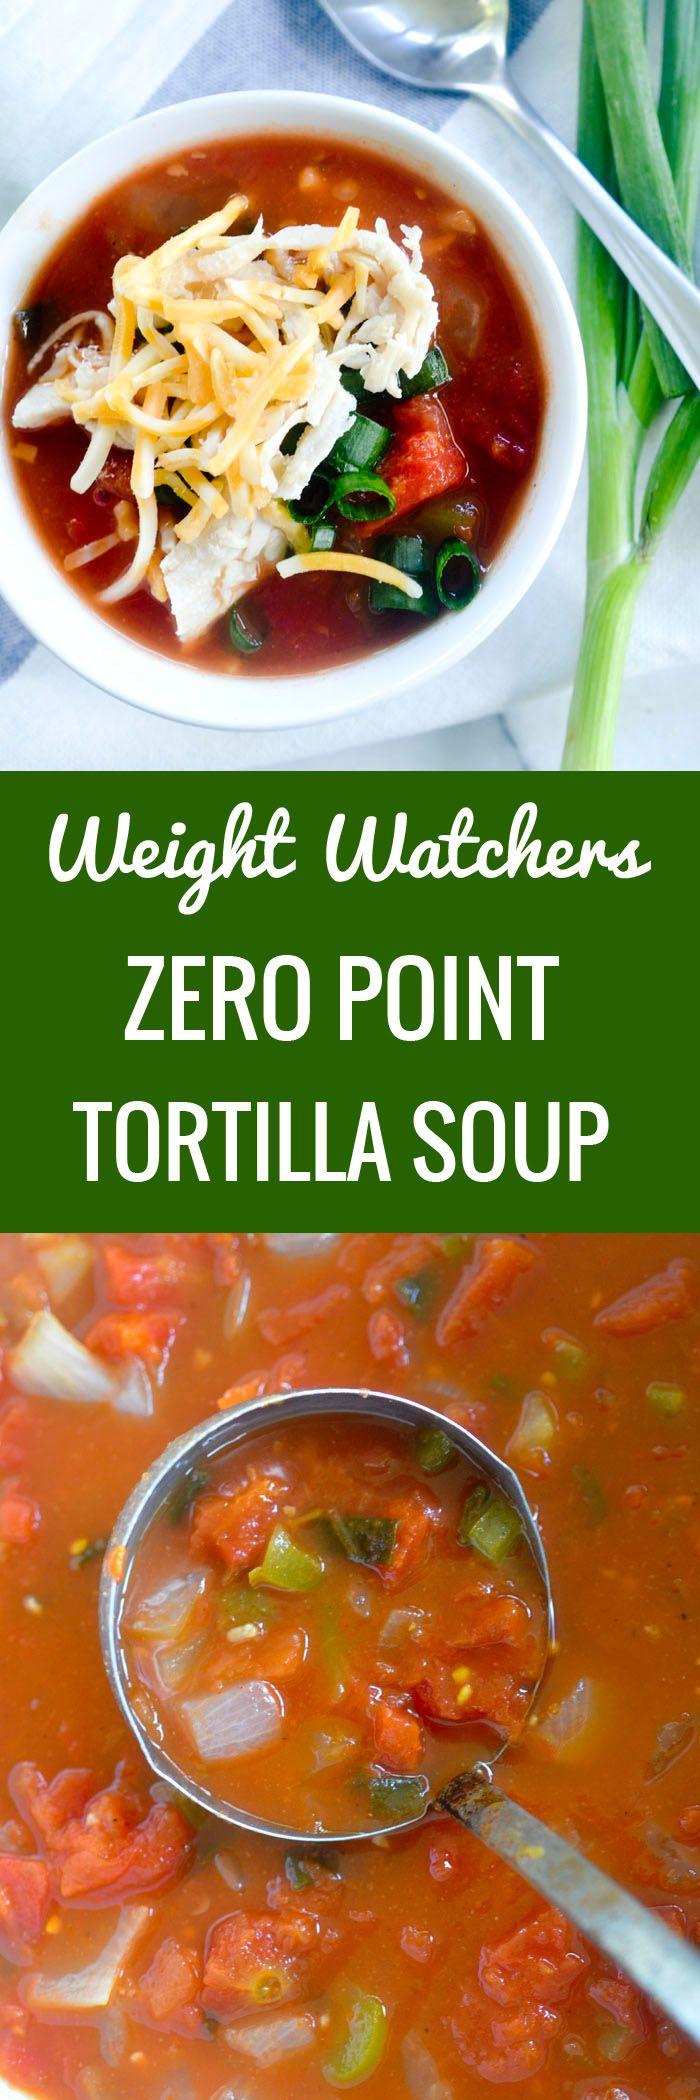 Weight Watchers Zero Point Tortilla Soup - Recipe Diaries